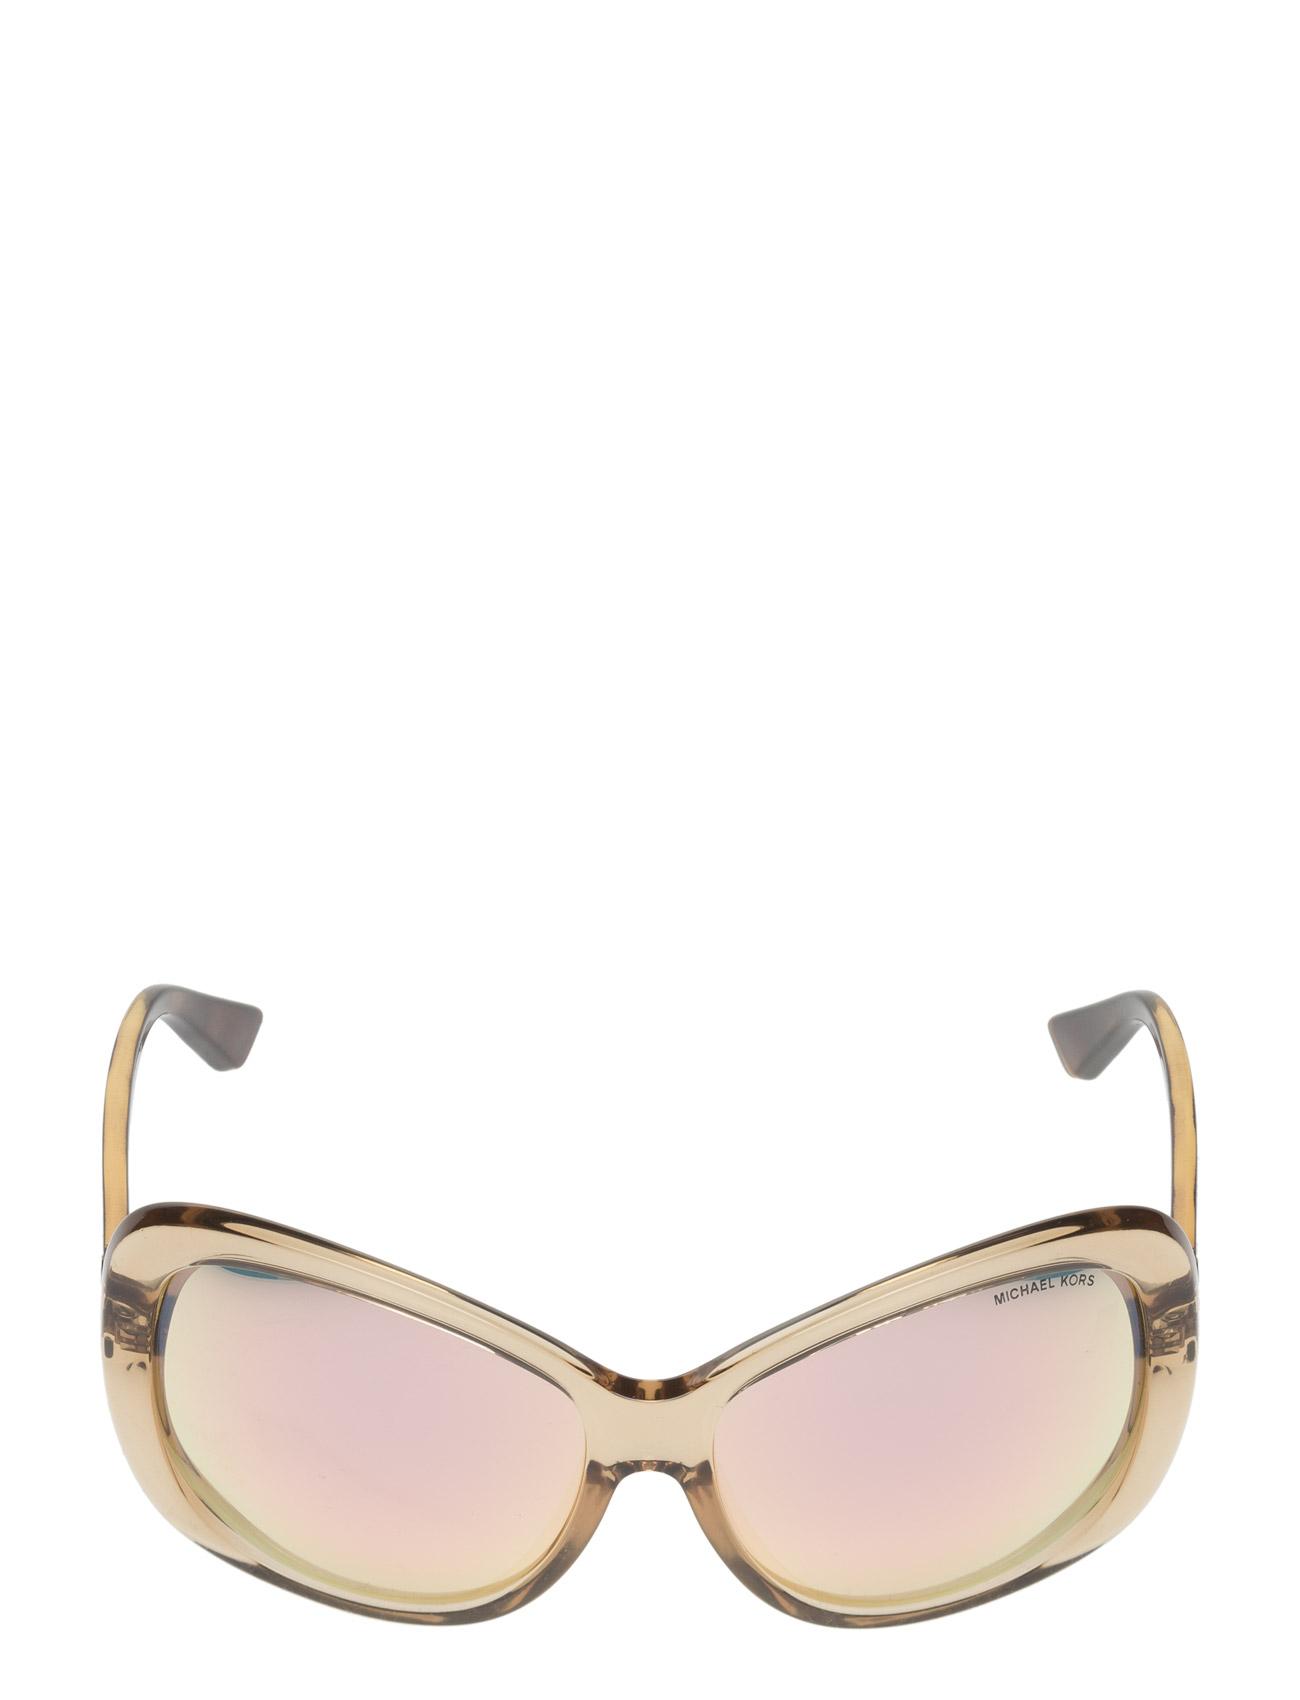 Hanalei Bay Michael Kors Sunglasses Solbriller til Kvinder i Brun